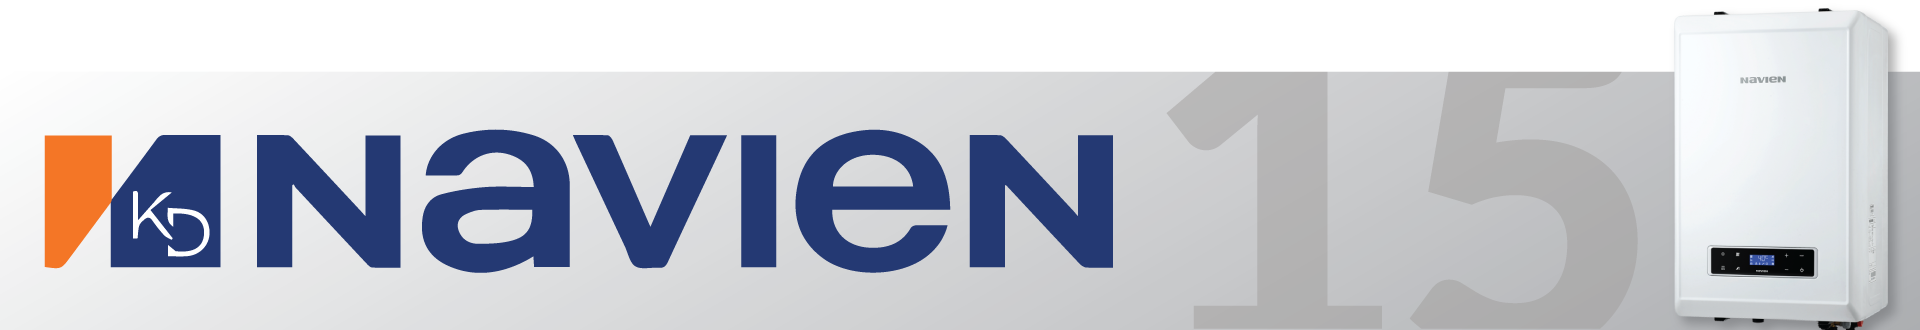 Navien 15 Year Guarantee Exclusive to Causeway Heating